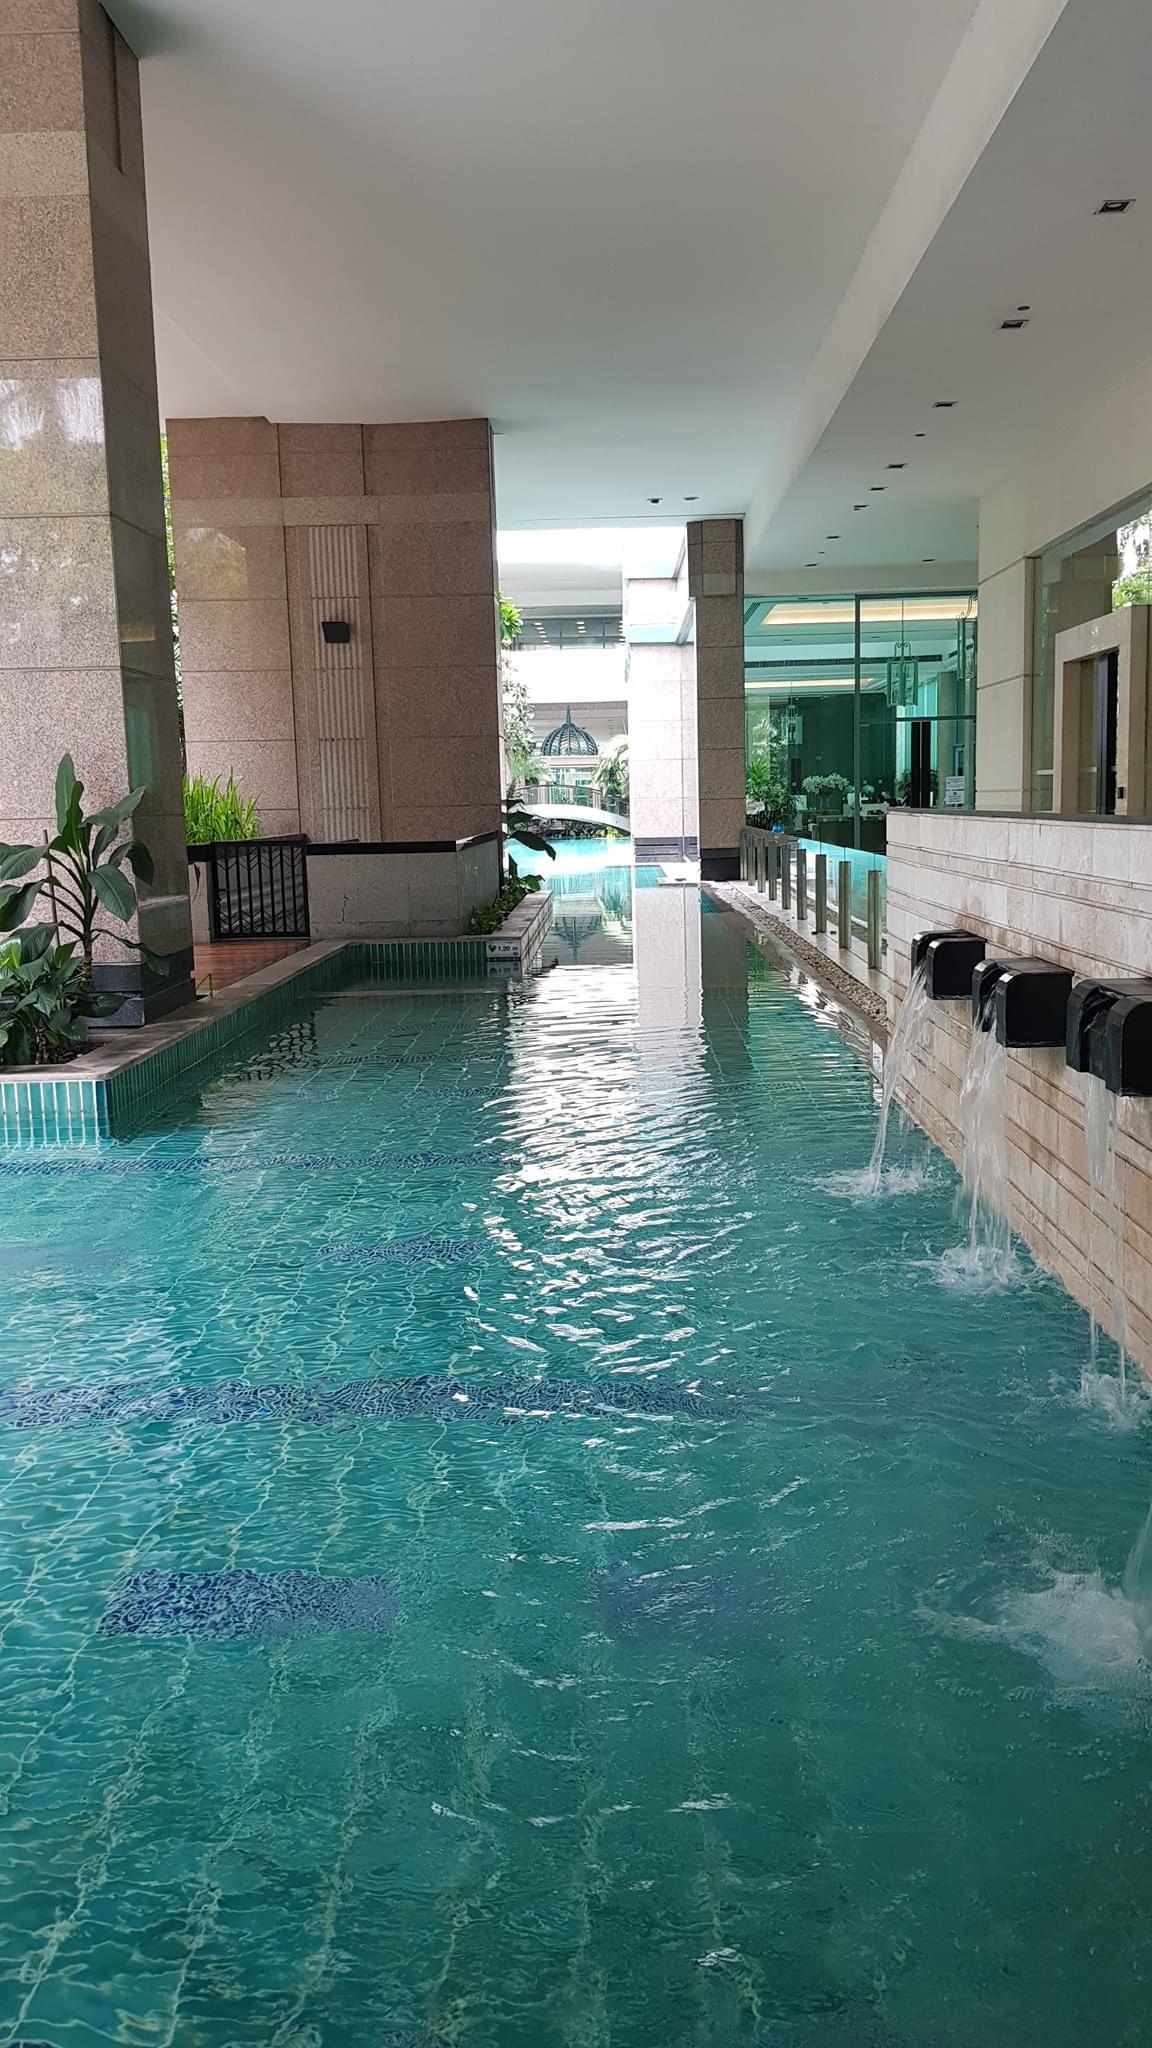 Bangkok Condo Apartment For Rent in Chidlom Sukhumvit Supreme Class Location